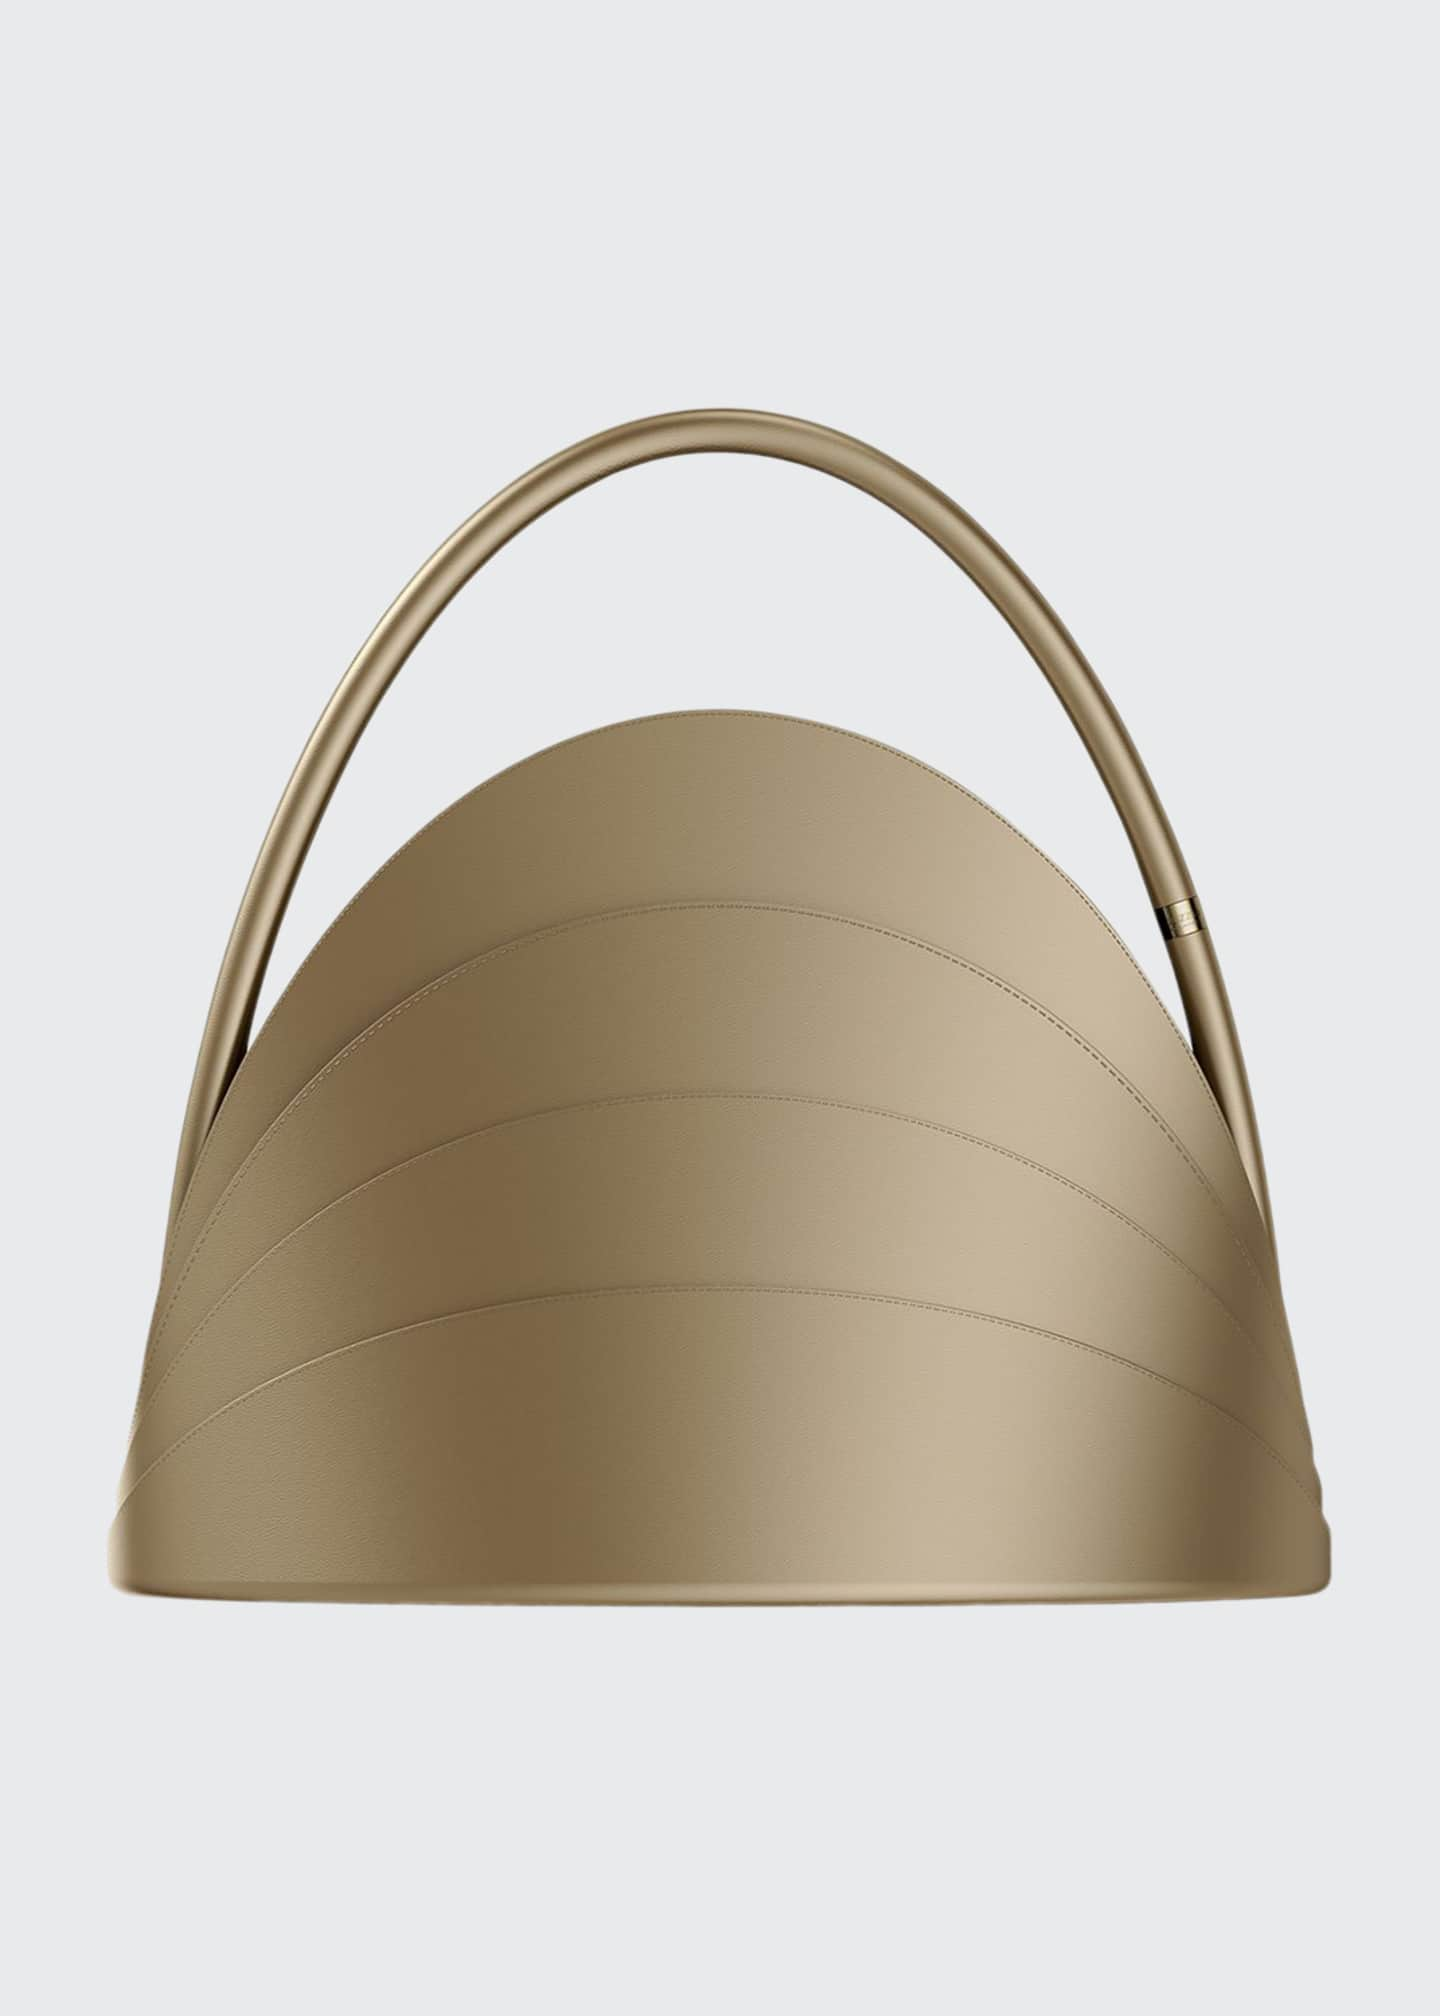 Gabo Guzzo Millefoglie Layered Top-Handle Bag, Brown